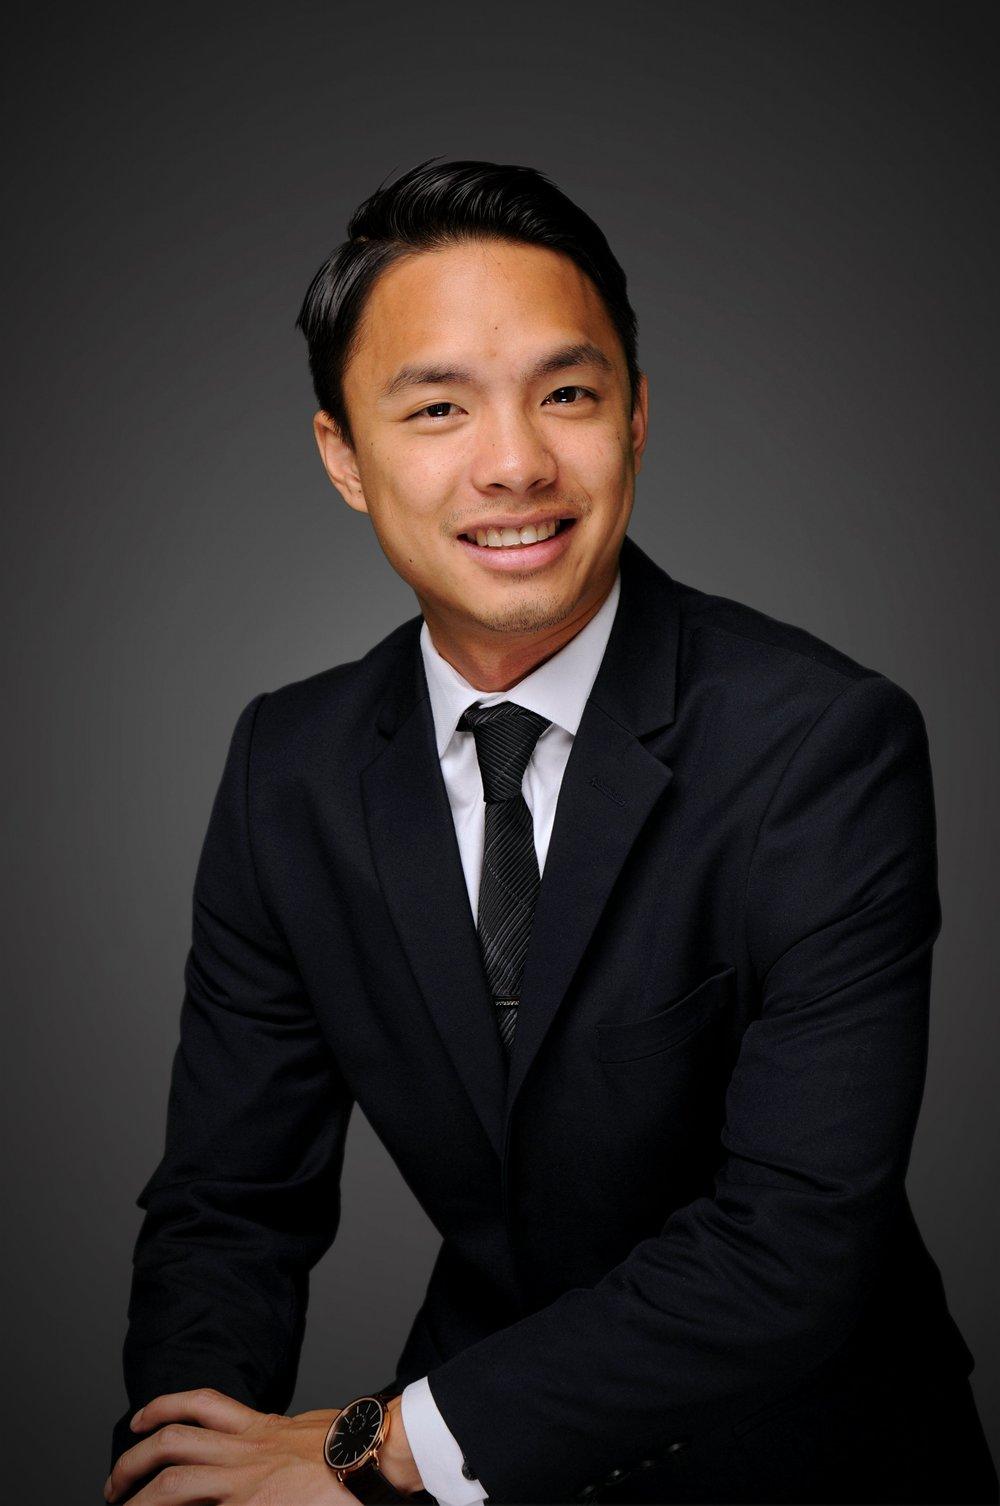 Jonathan Koo, NYU Stern School of Business MBA '18